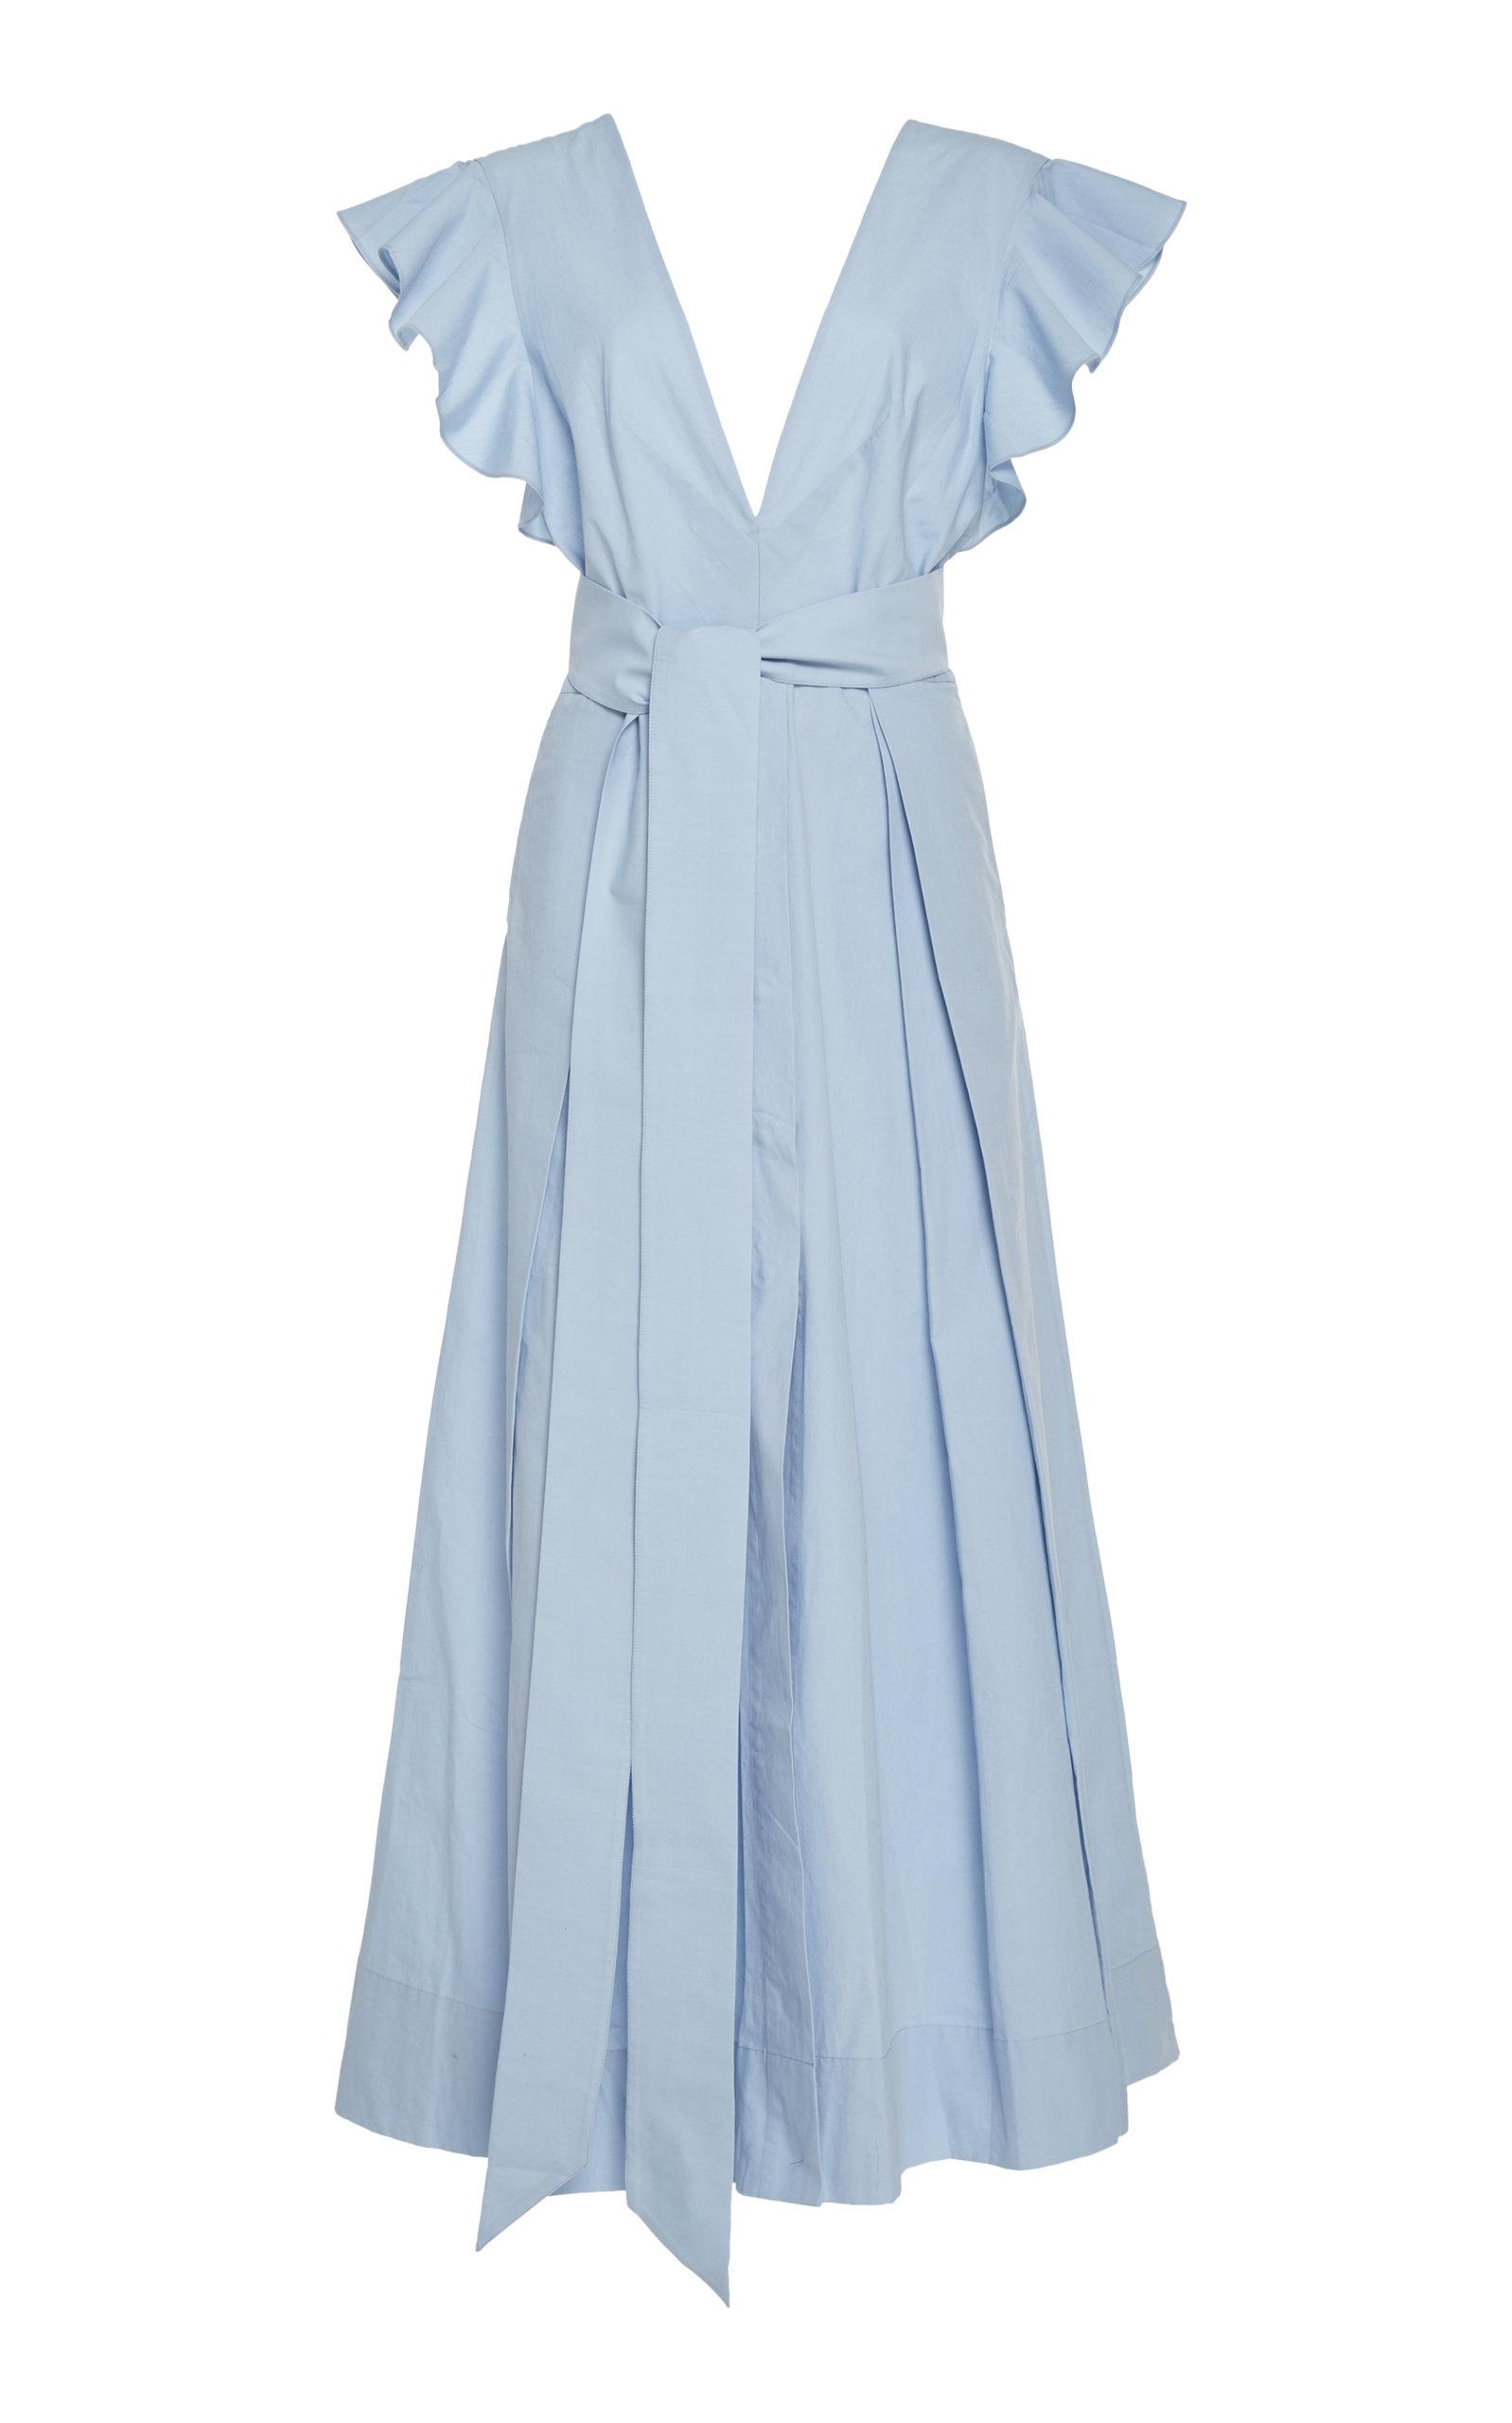 Kalita NEW POET BY THE SEA BELTED COTTON-POPLIN MAXI DRESS SIZE: XXS